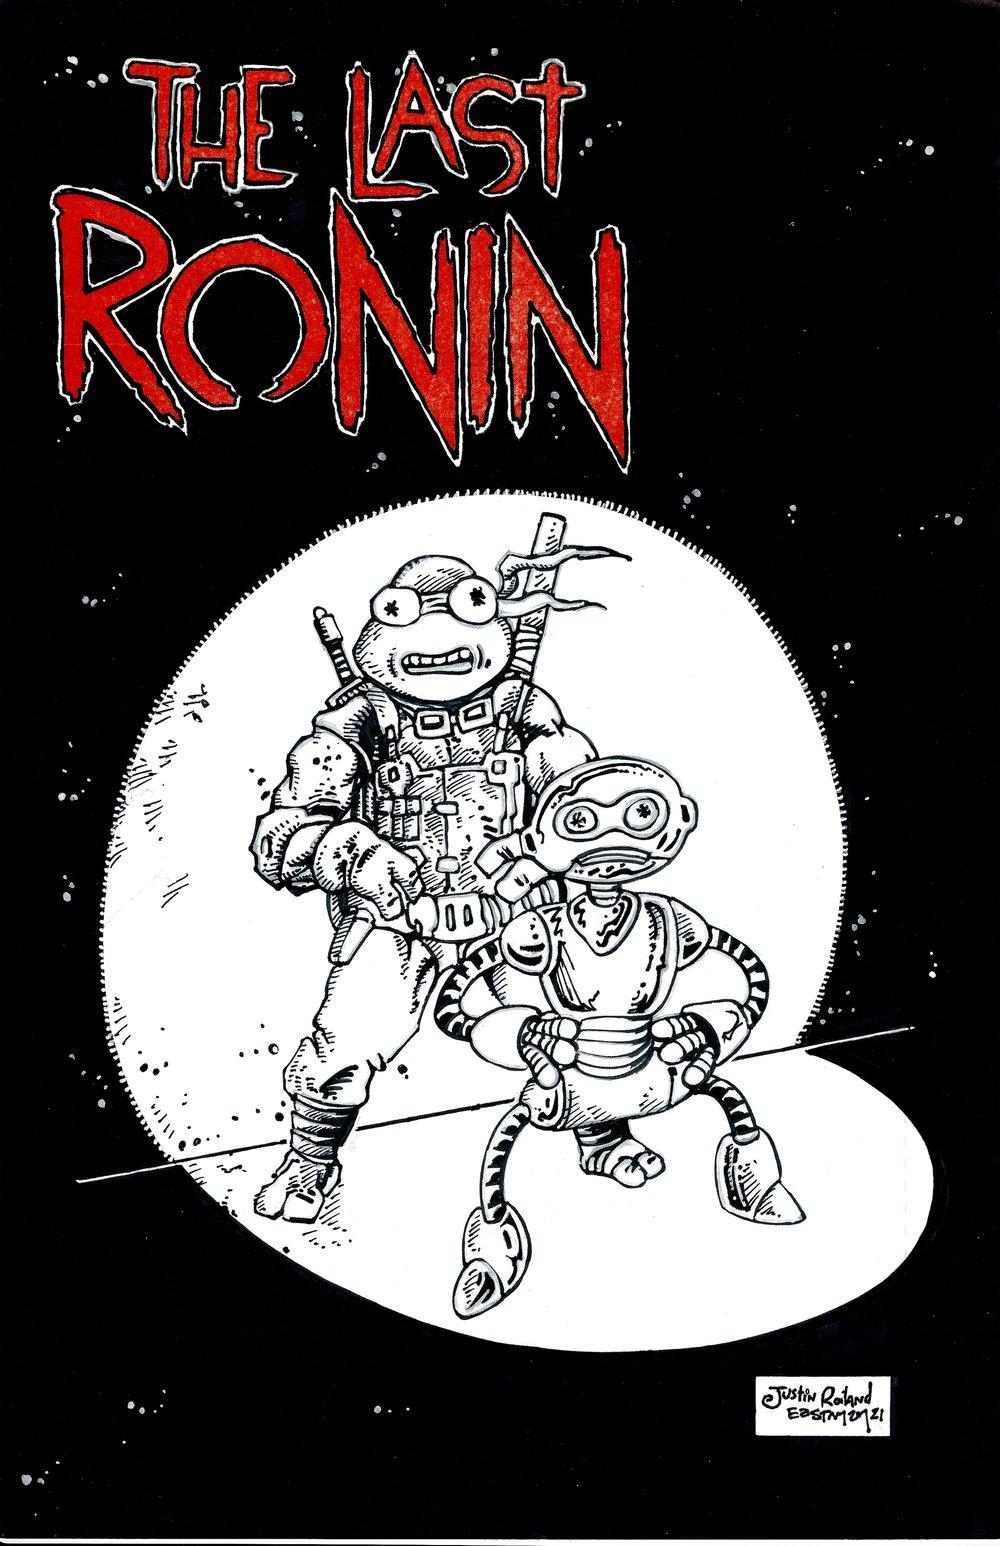 Teenage Mutant Ninja Turtles: The Last Ronin #4 - Variant - 3 Pack (PRE-ORDER)